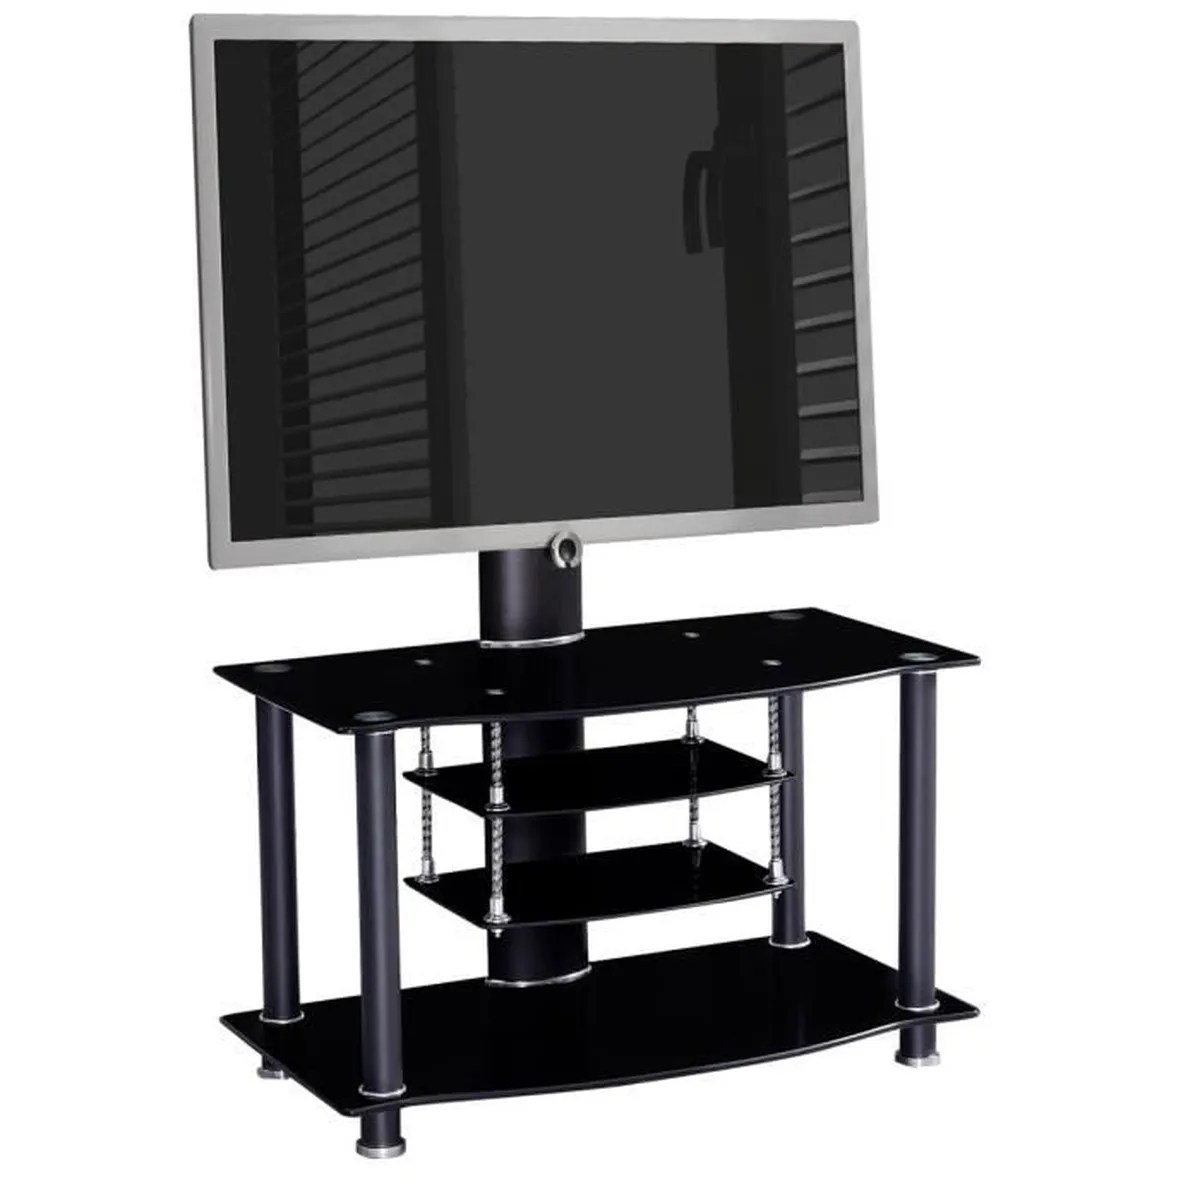 Meuble Design Tv Ecran Plat Destockage Tv Ecran Plat Maison Design